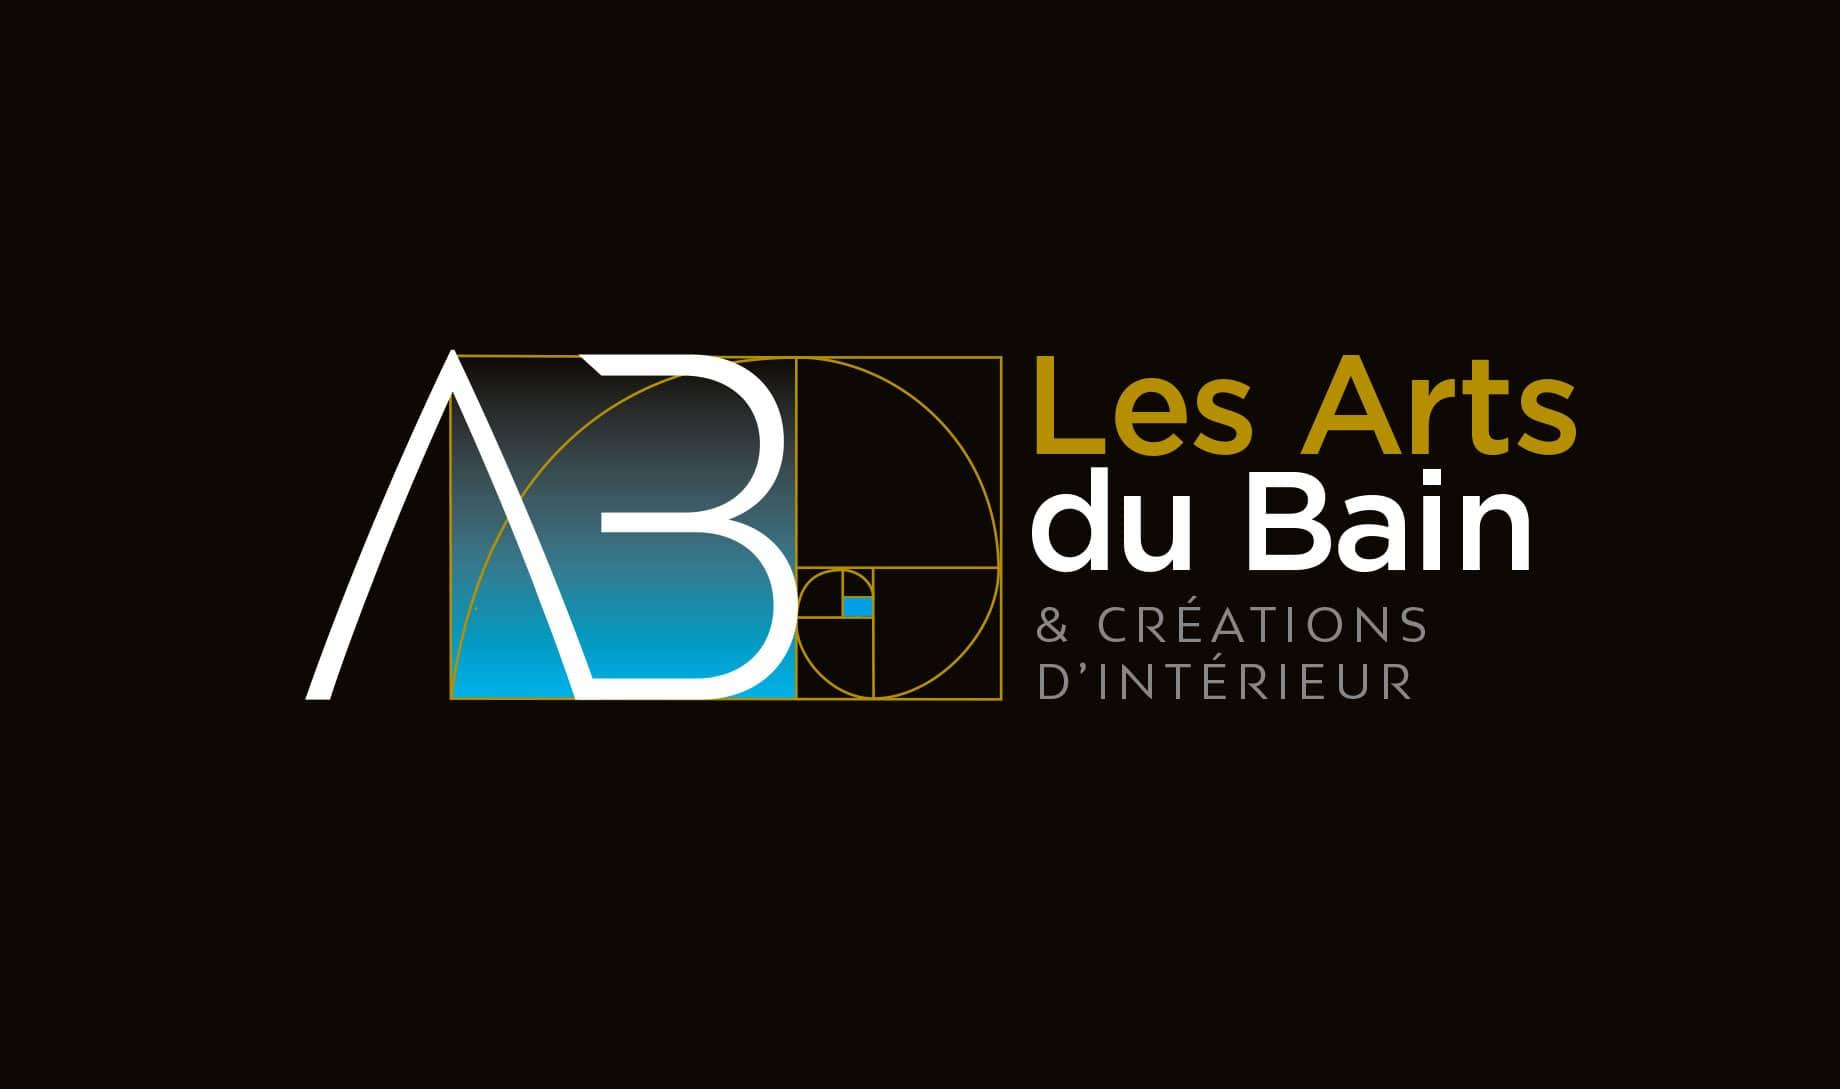 Les Arts du Bain - logo et naming